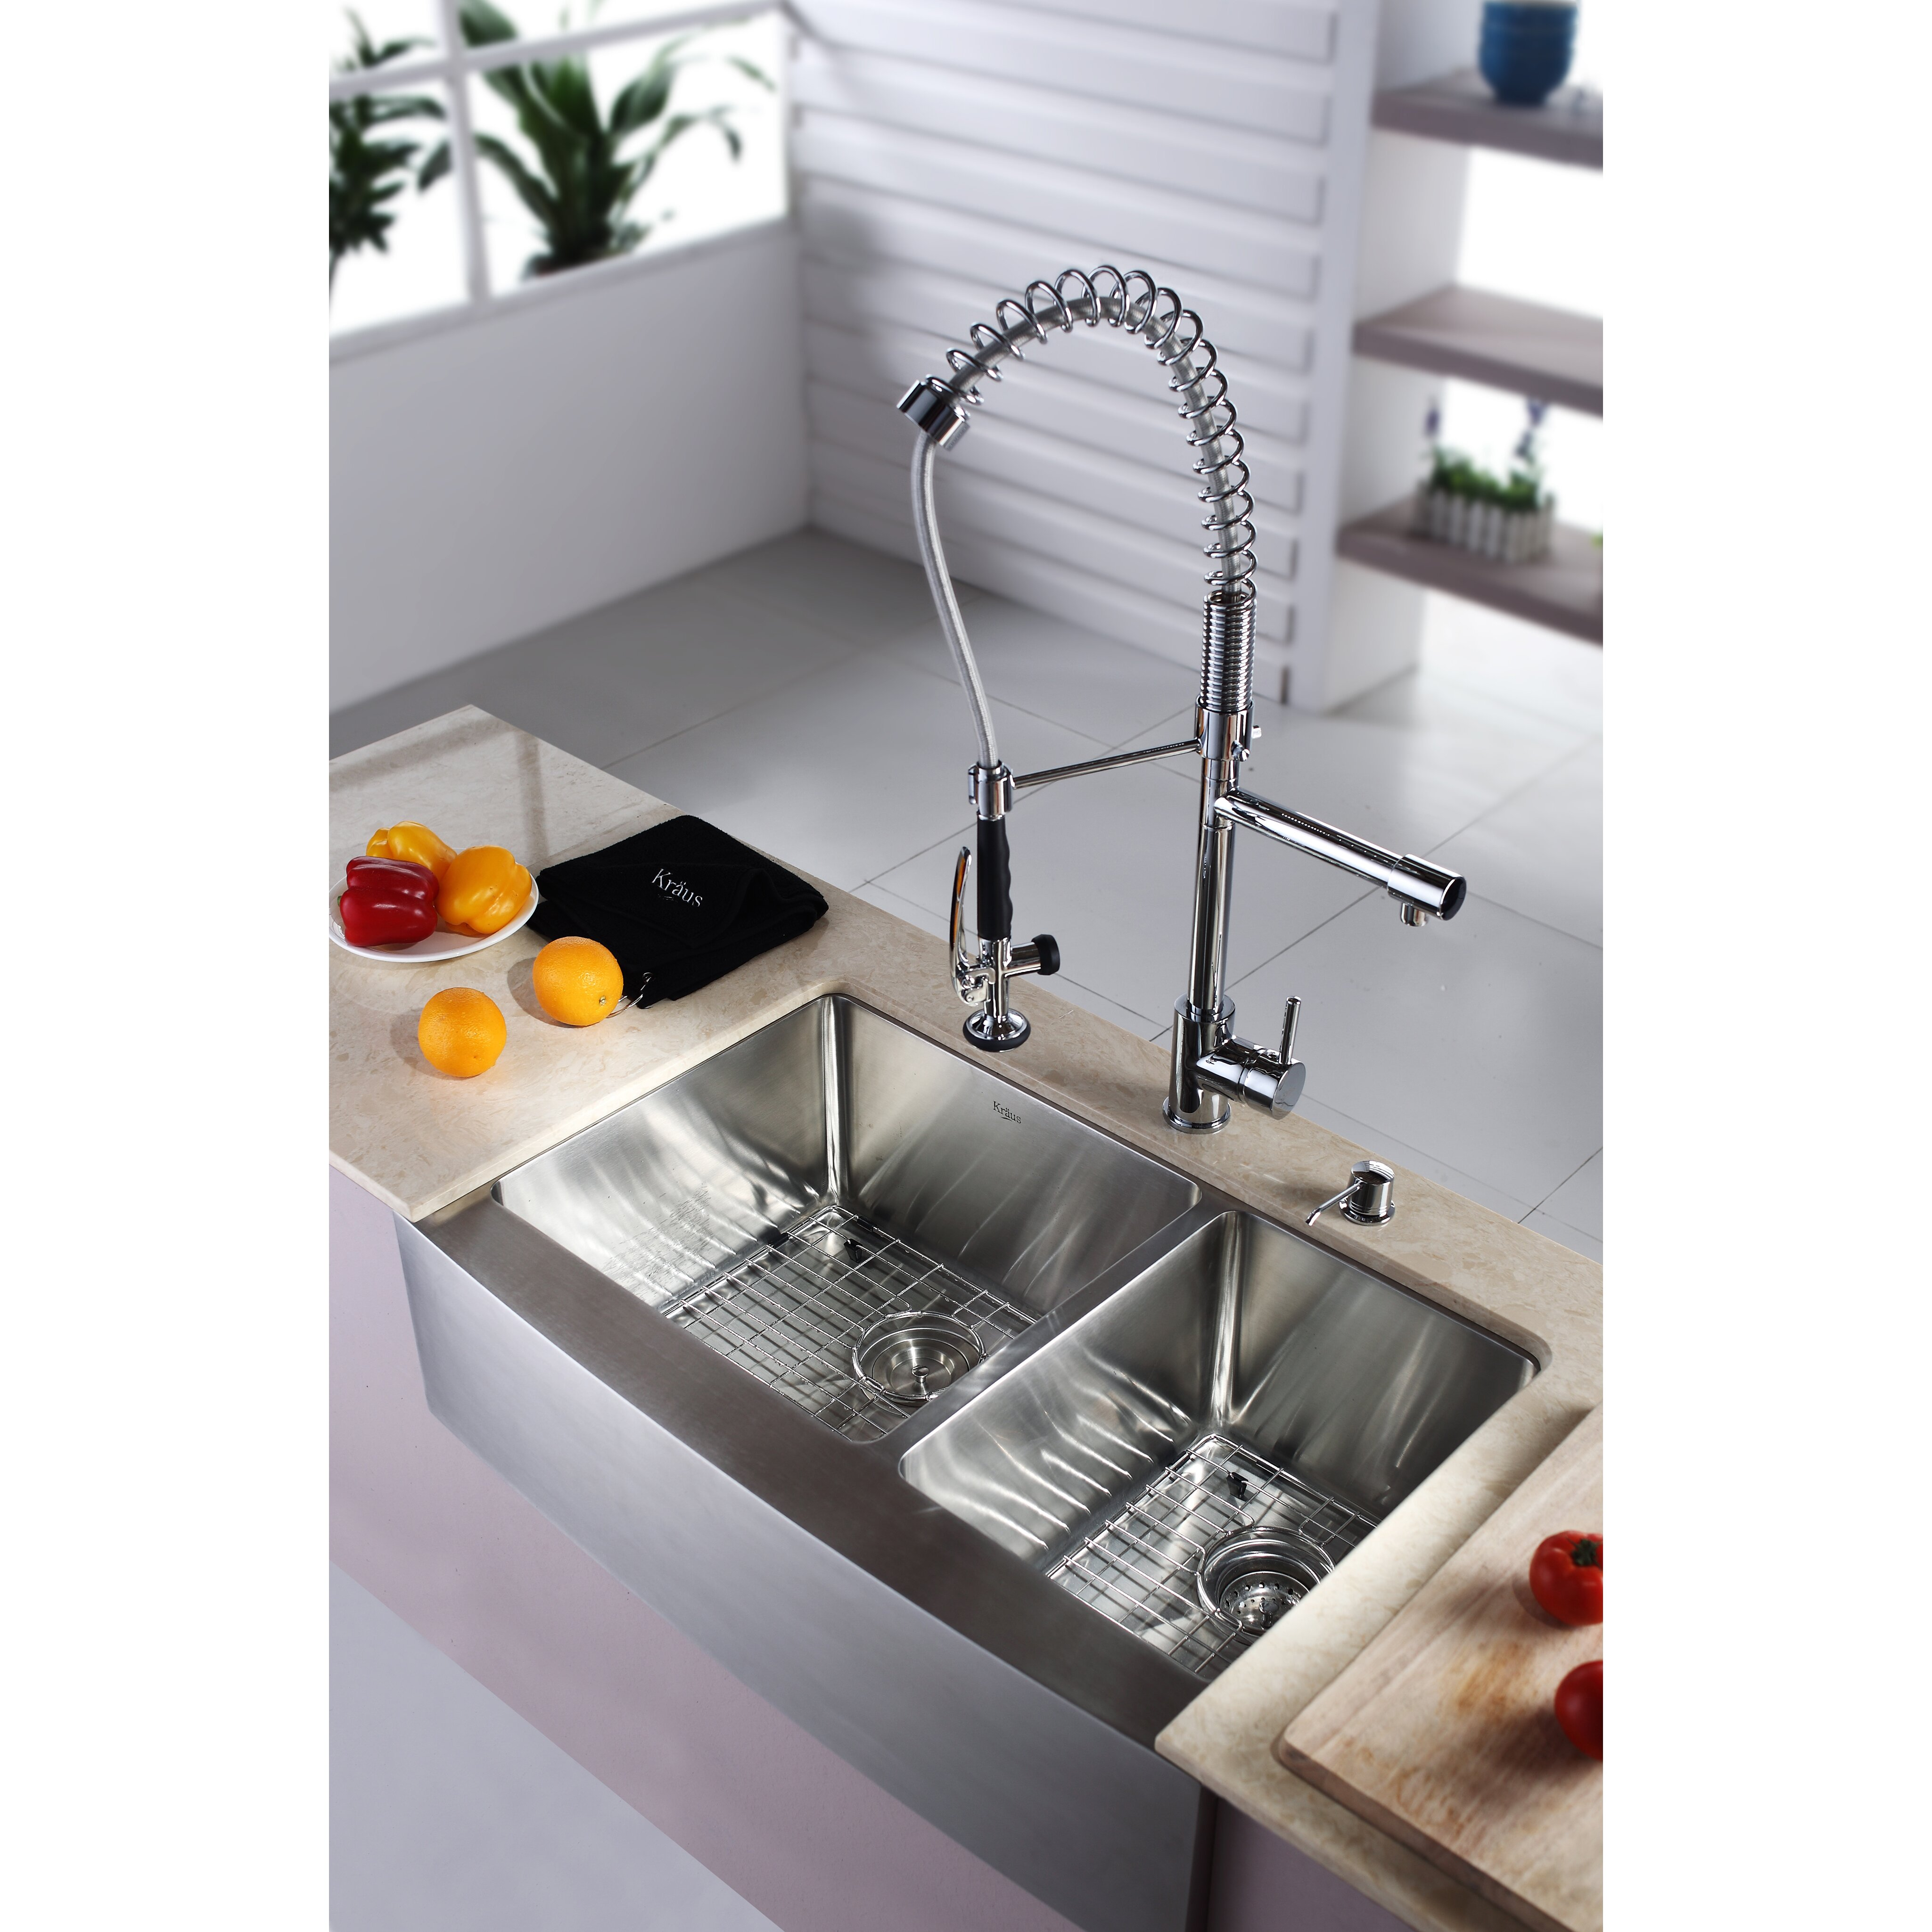 kraus 32 9 x farmhouse kitchen sink with faucet and soap dispenser reviews wayfair. Black Bedroom Furniture Sets. Home Design Ideas